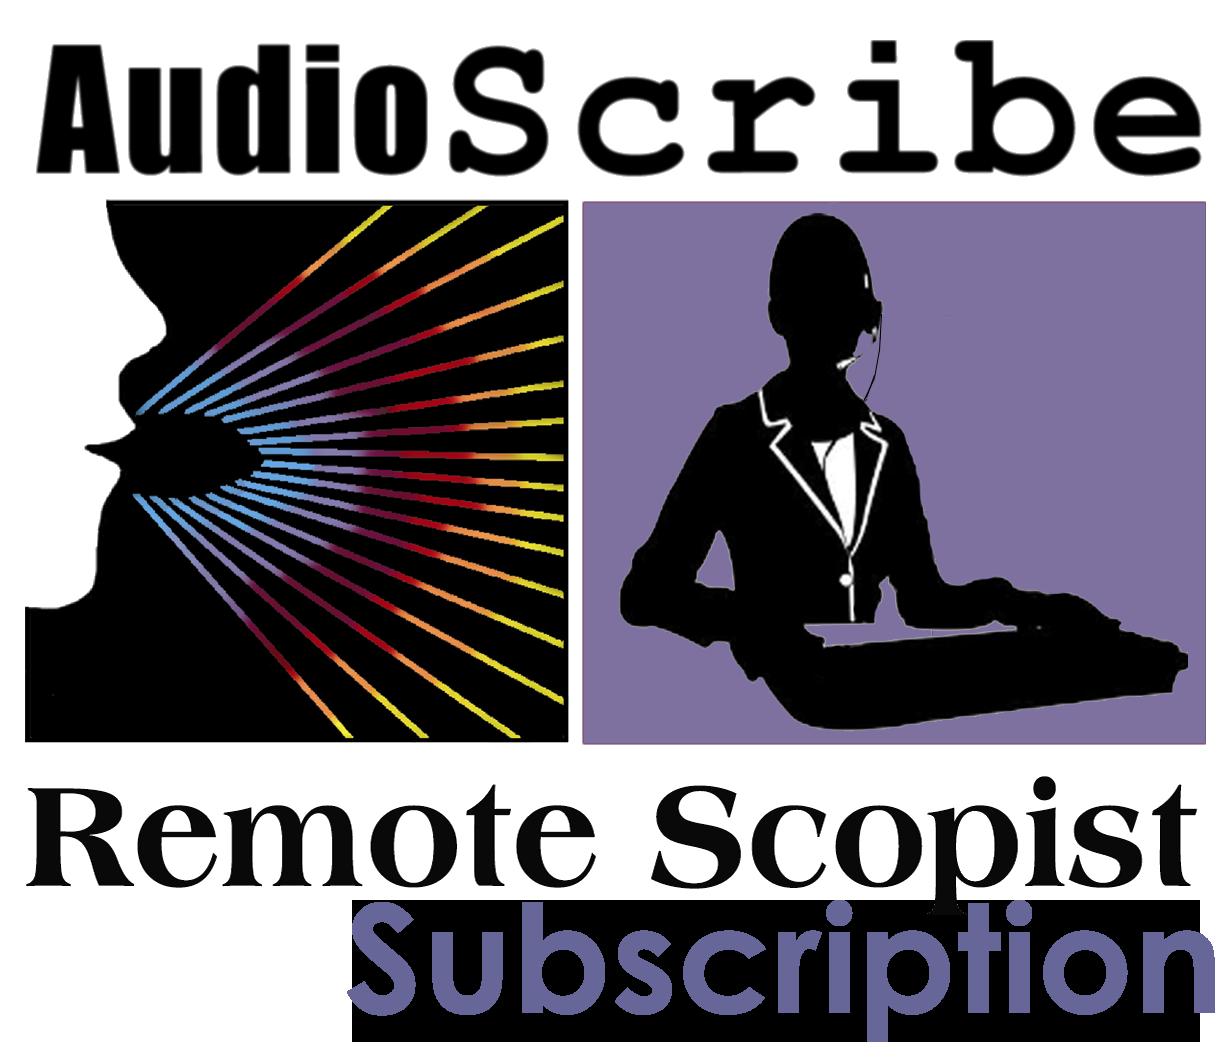 Remote Scopist Subscription